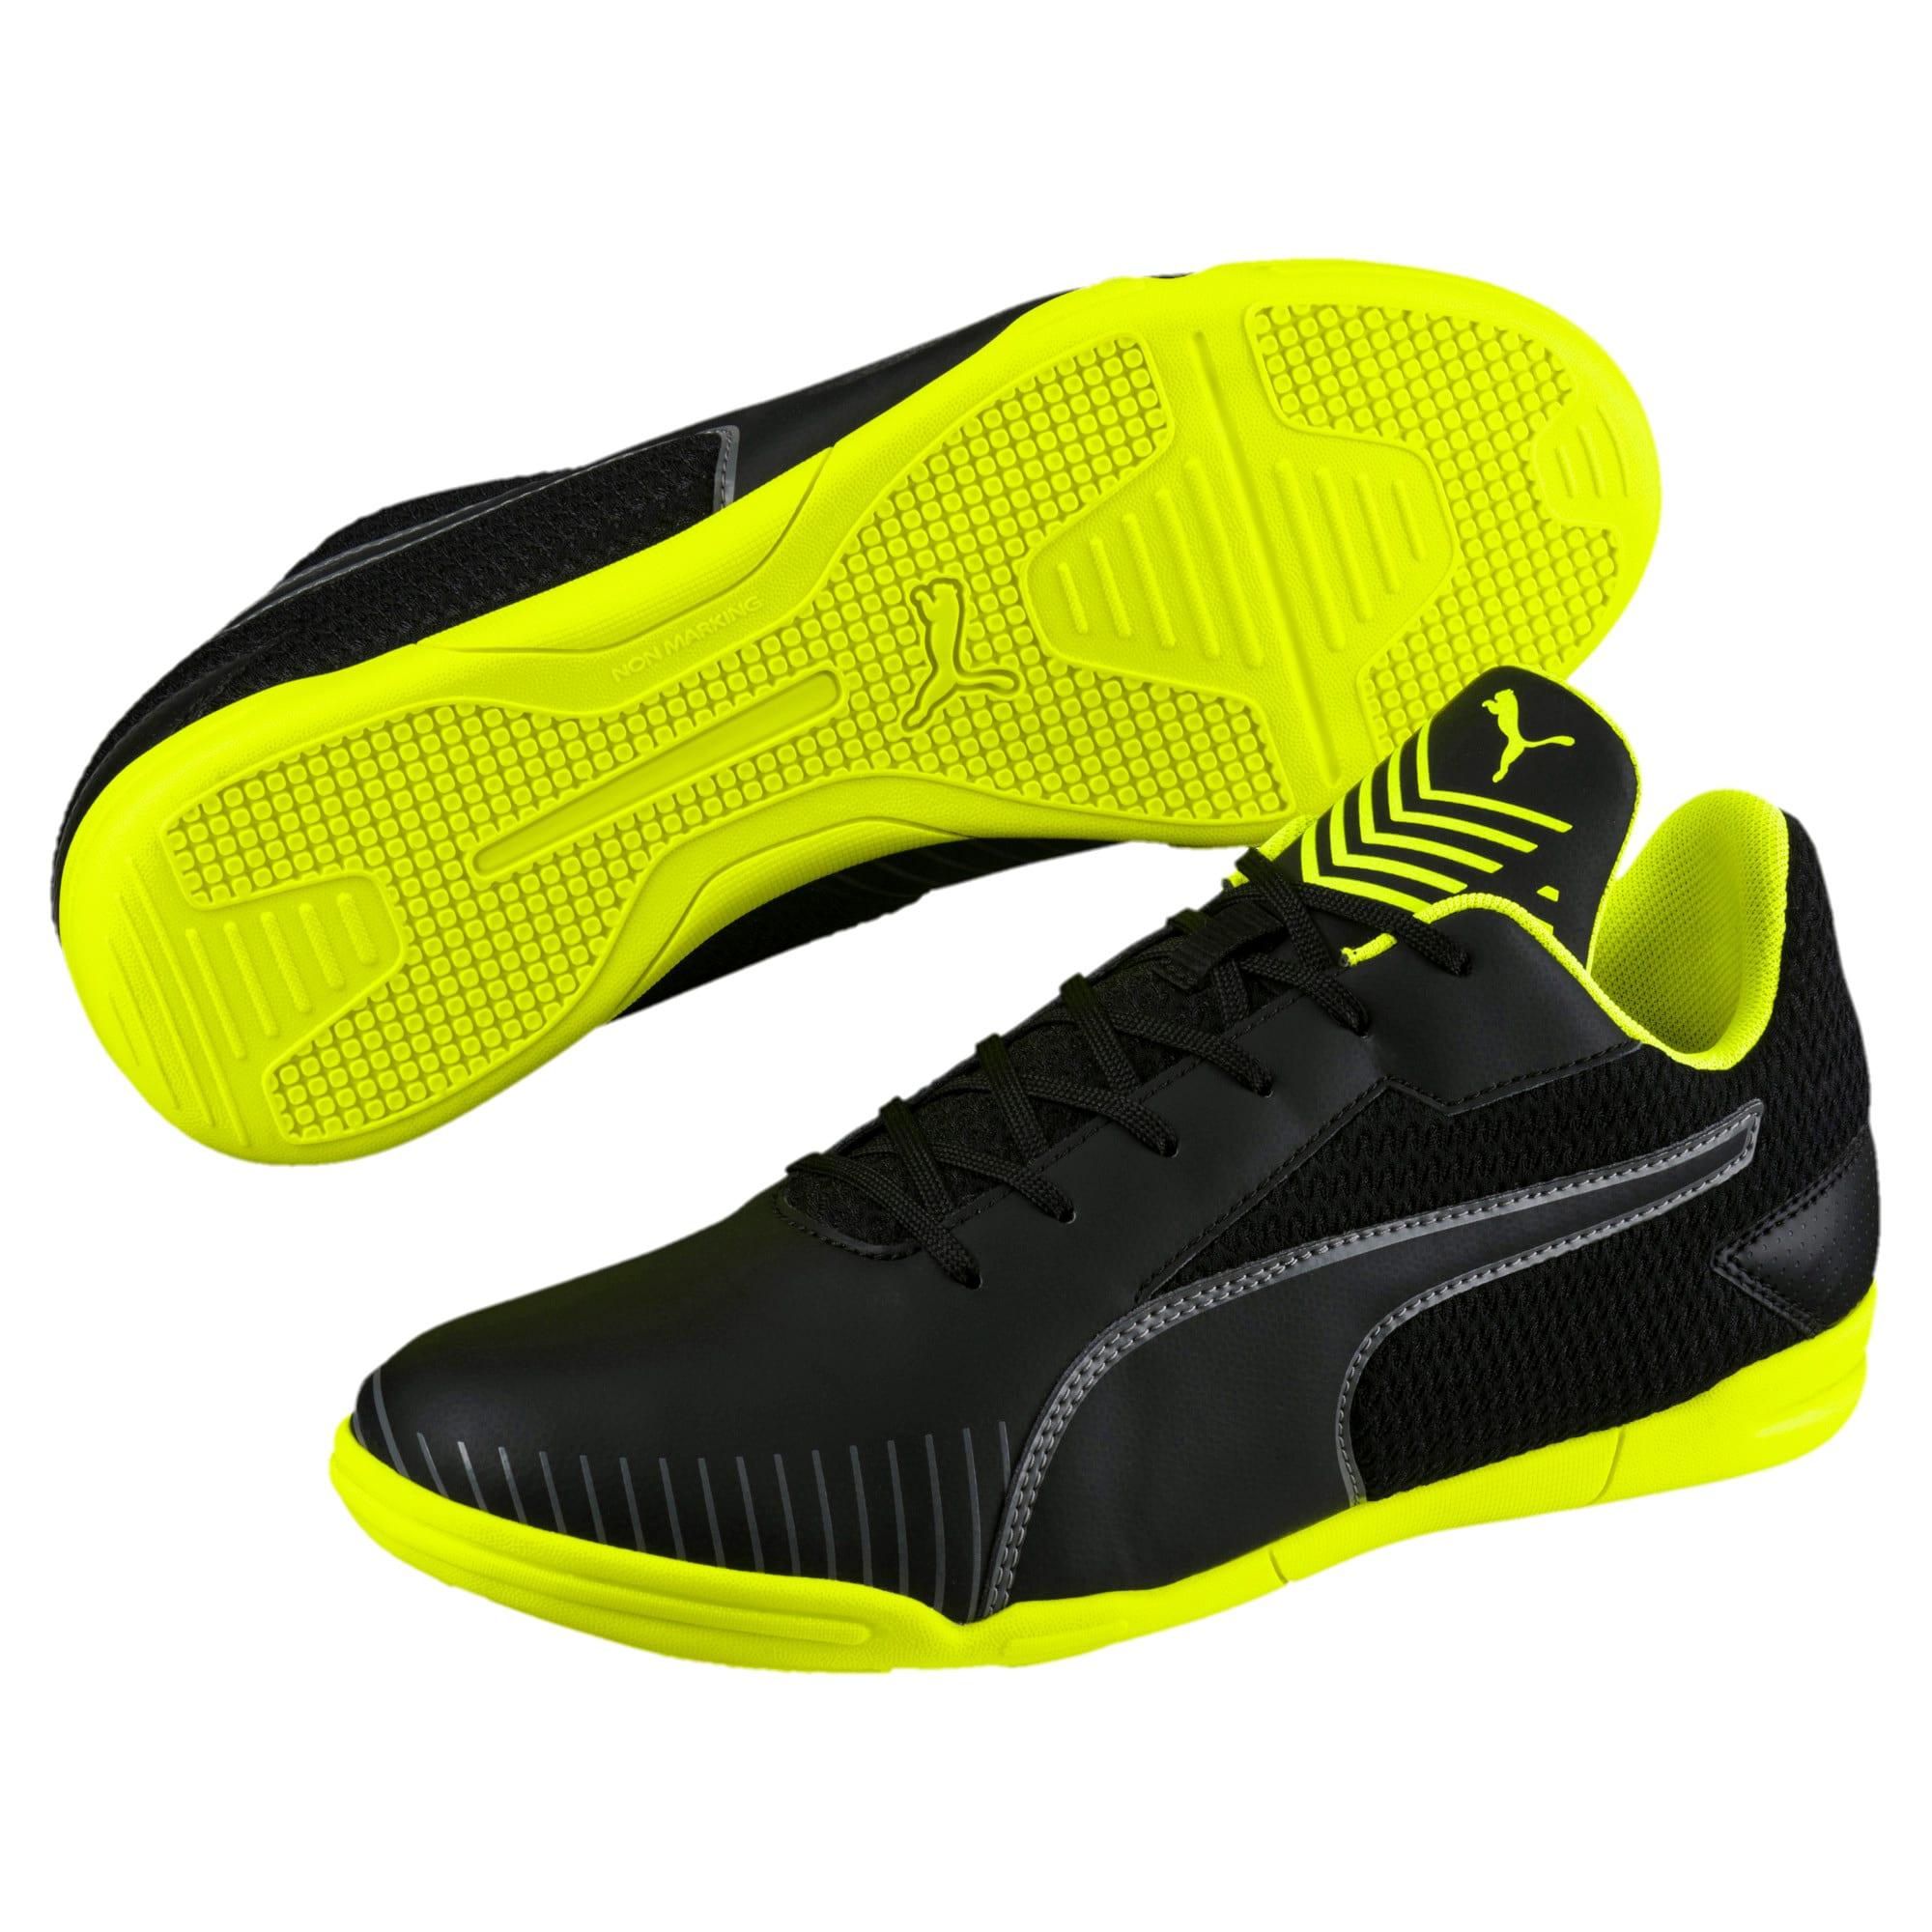 Thumbnail 2 of 365 CT Men's Court Football Shoes, Black-Black-Yellow-White, medium-IND